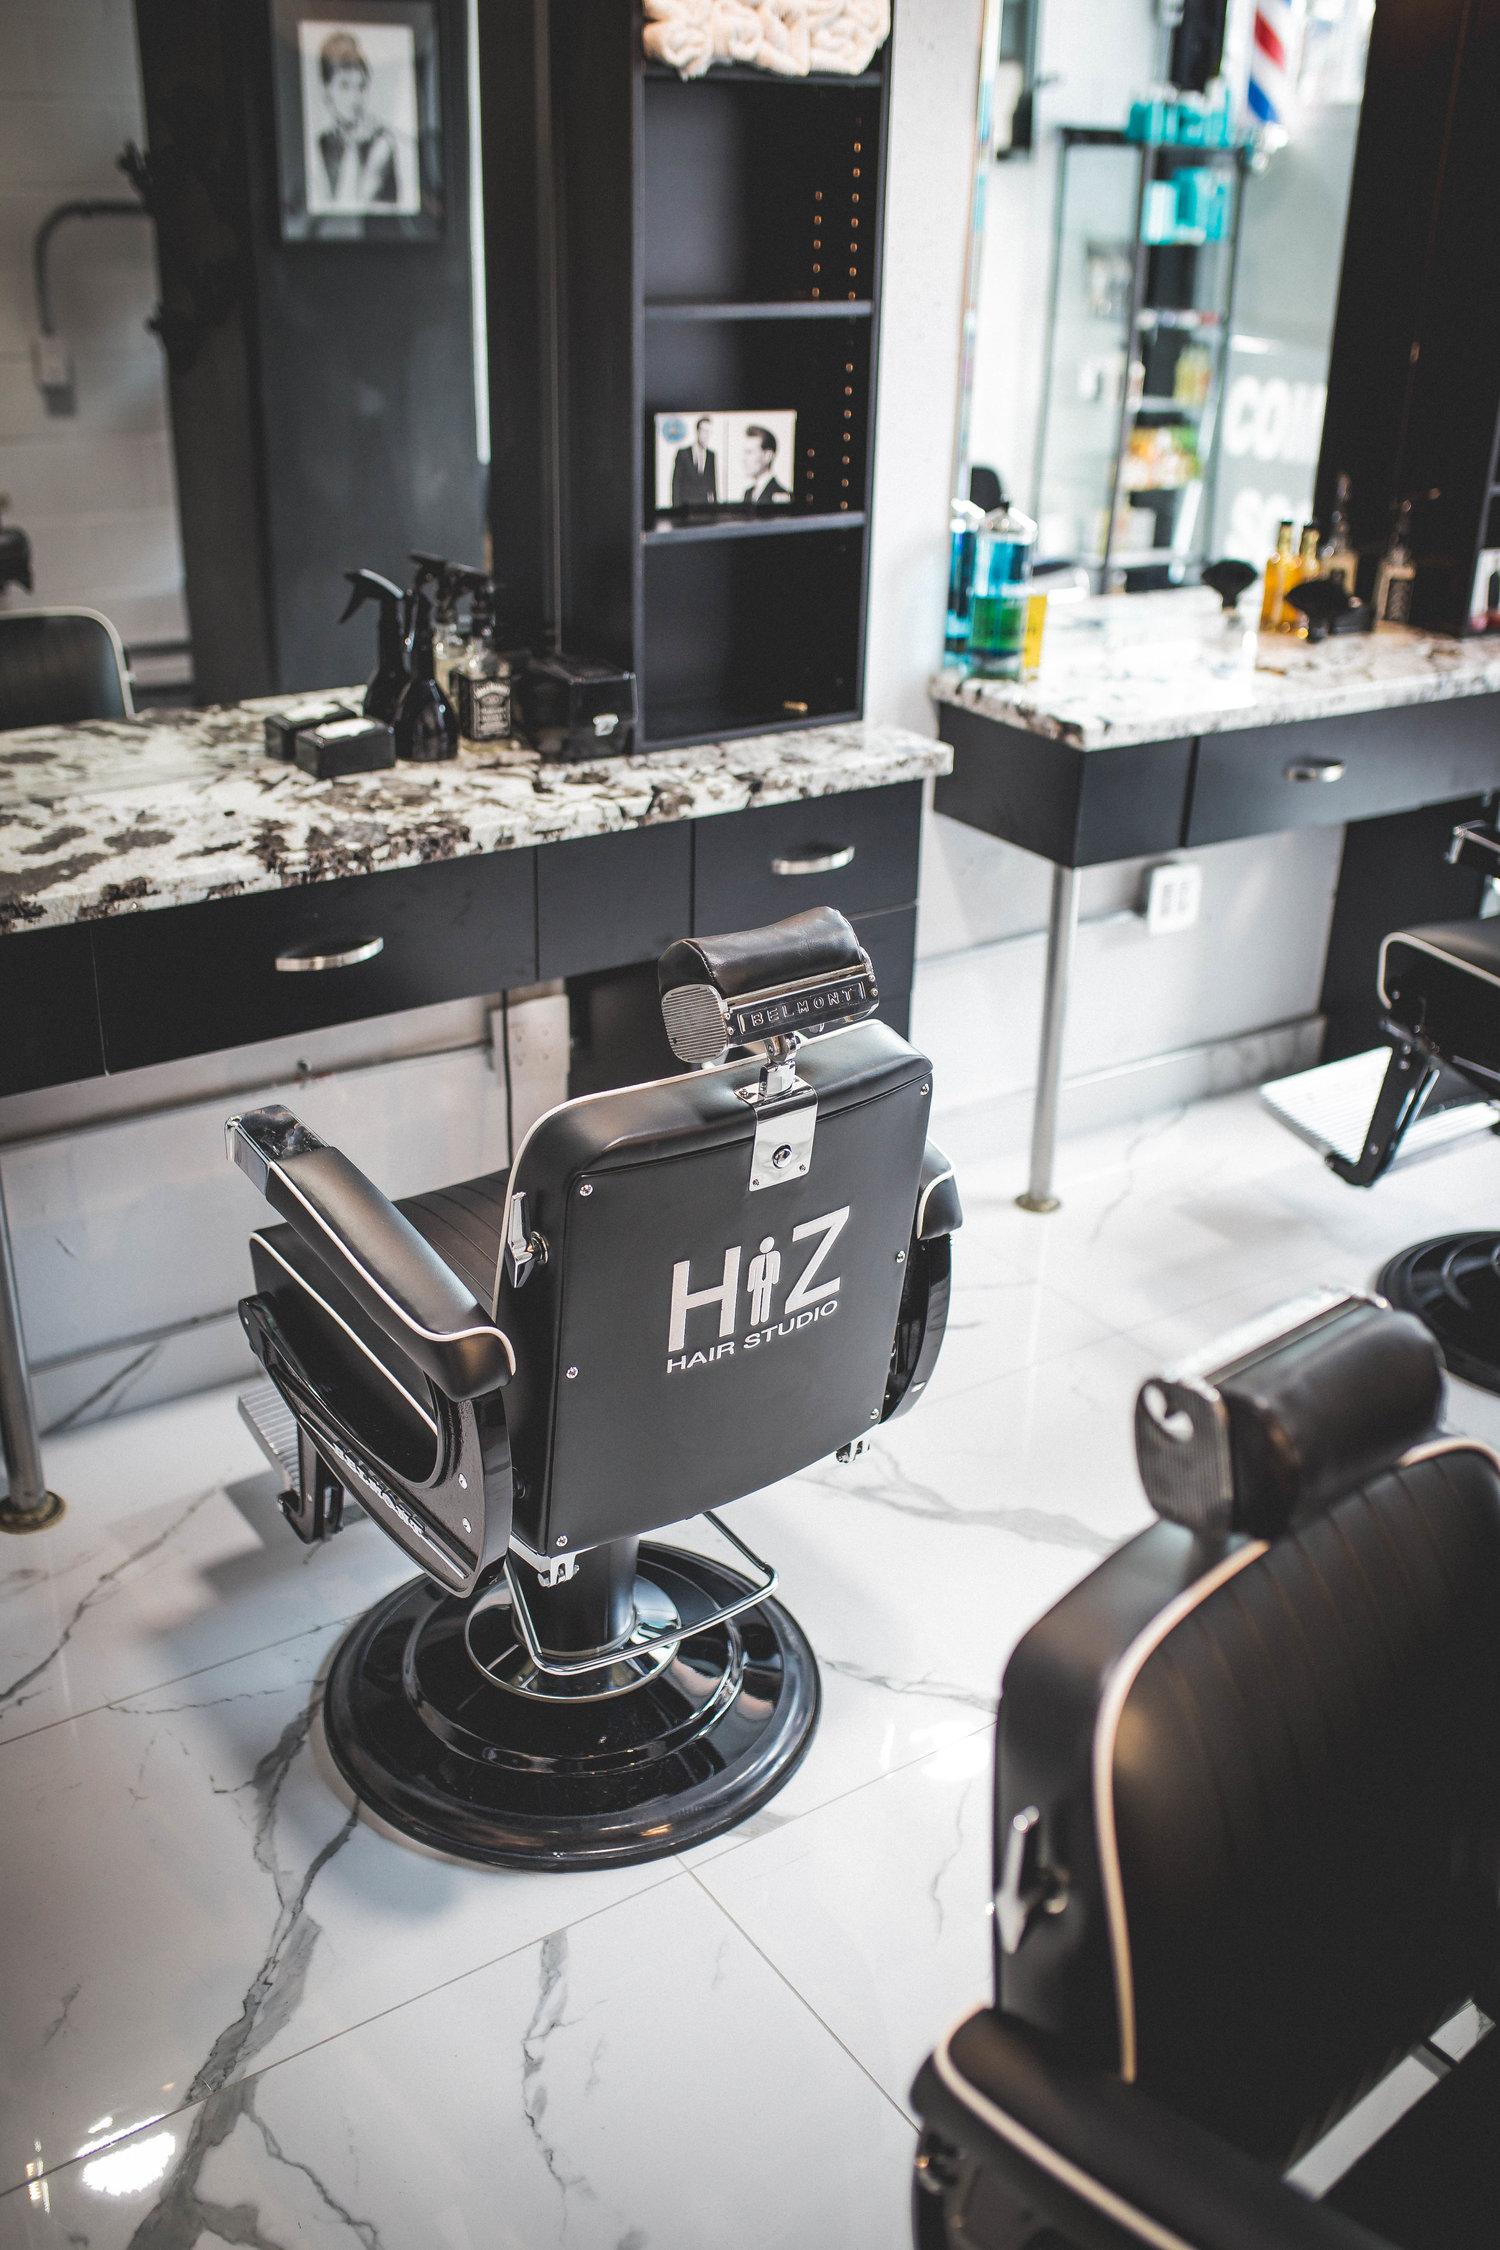 Hiz & Herz Hair Studio